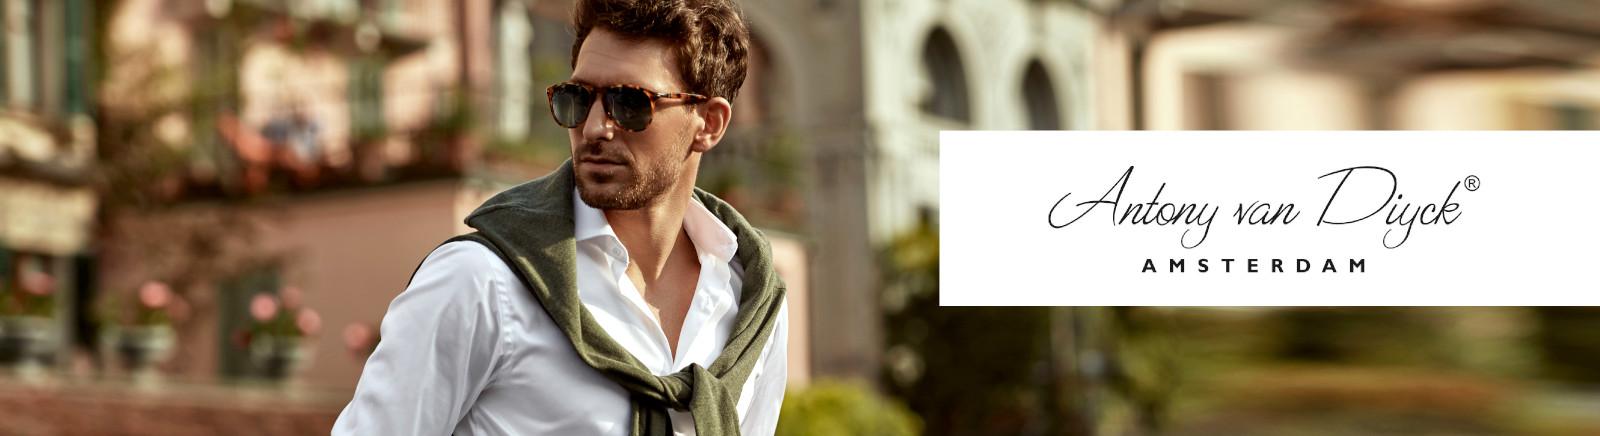 Antony van Diyck - qualitativ hochwertige Herrenschuhe online kaufen